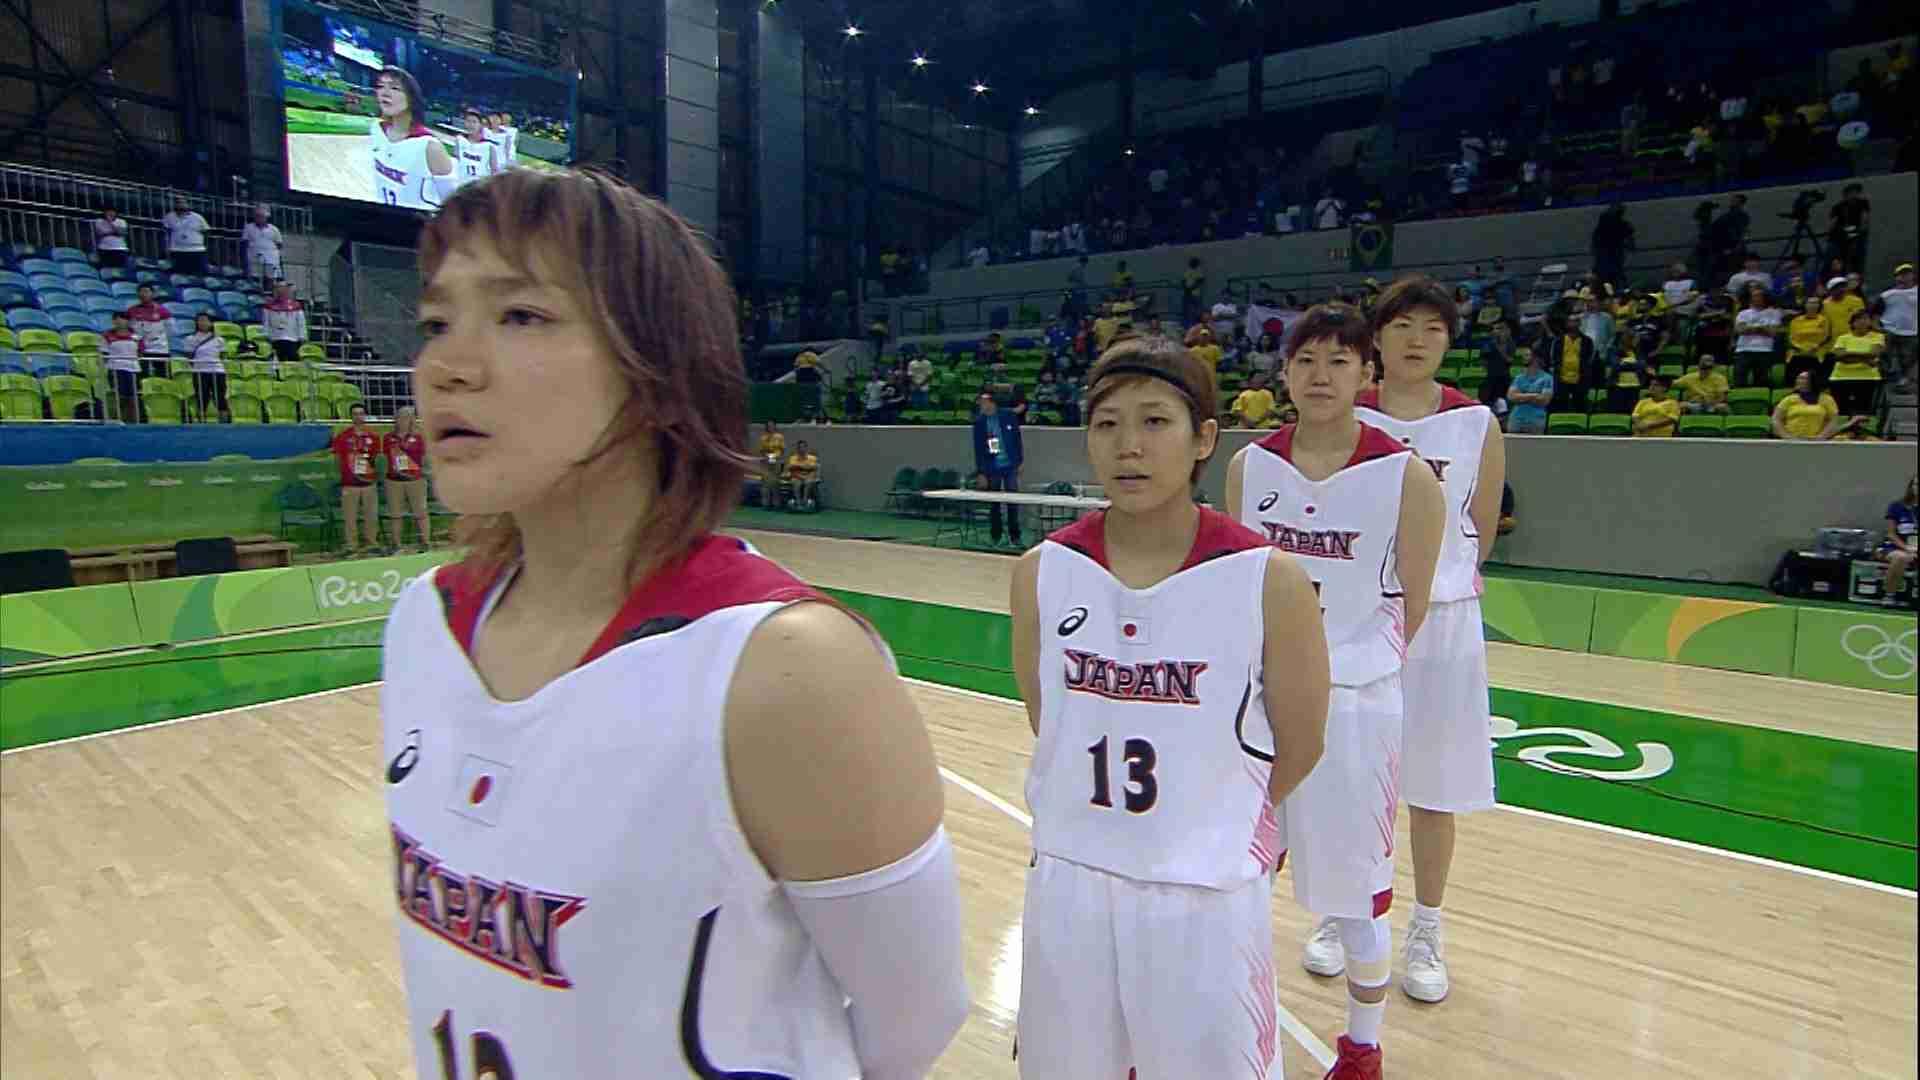 【NHKリオ】3ポイント8本成功 世界4位・フランスに勝利 バスケットボール女子 - YouTube